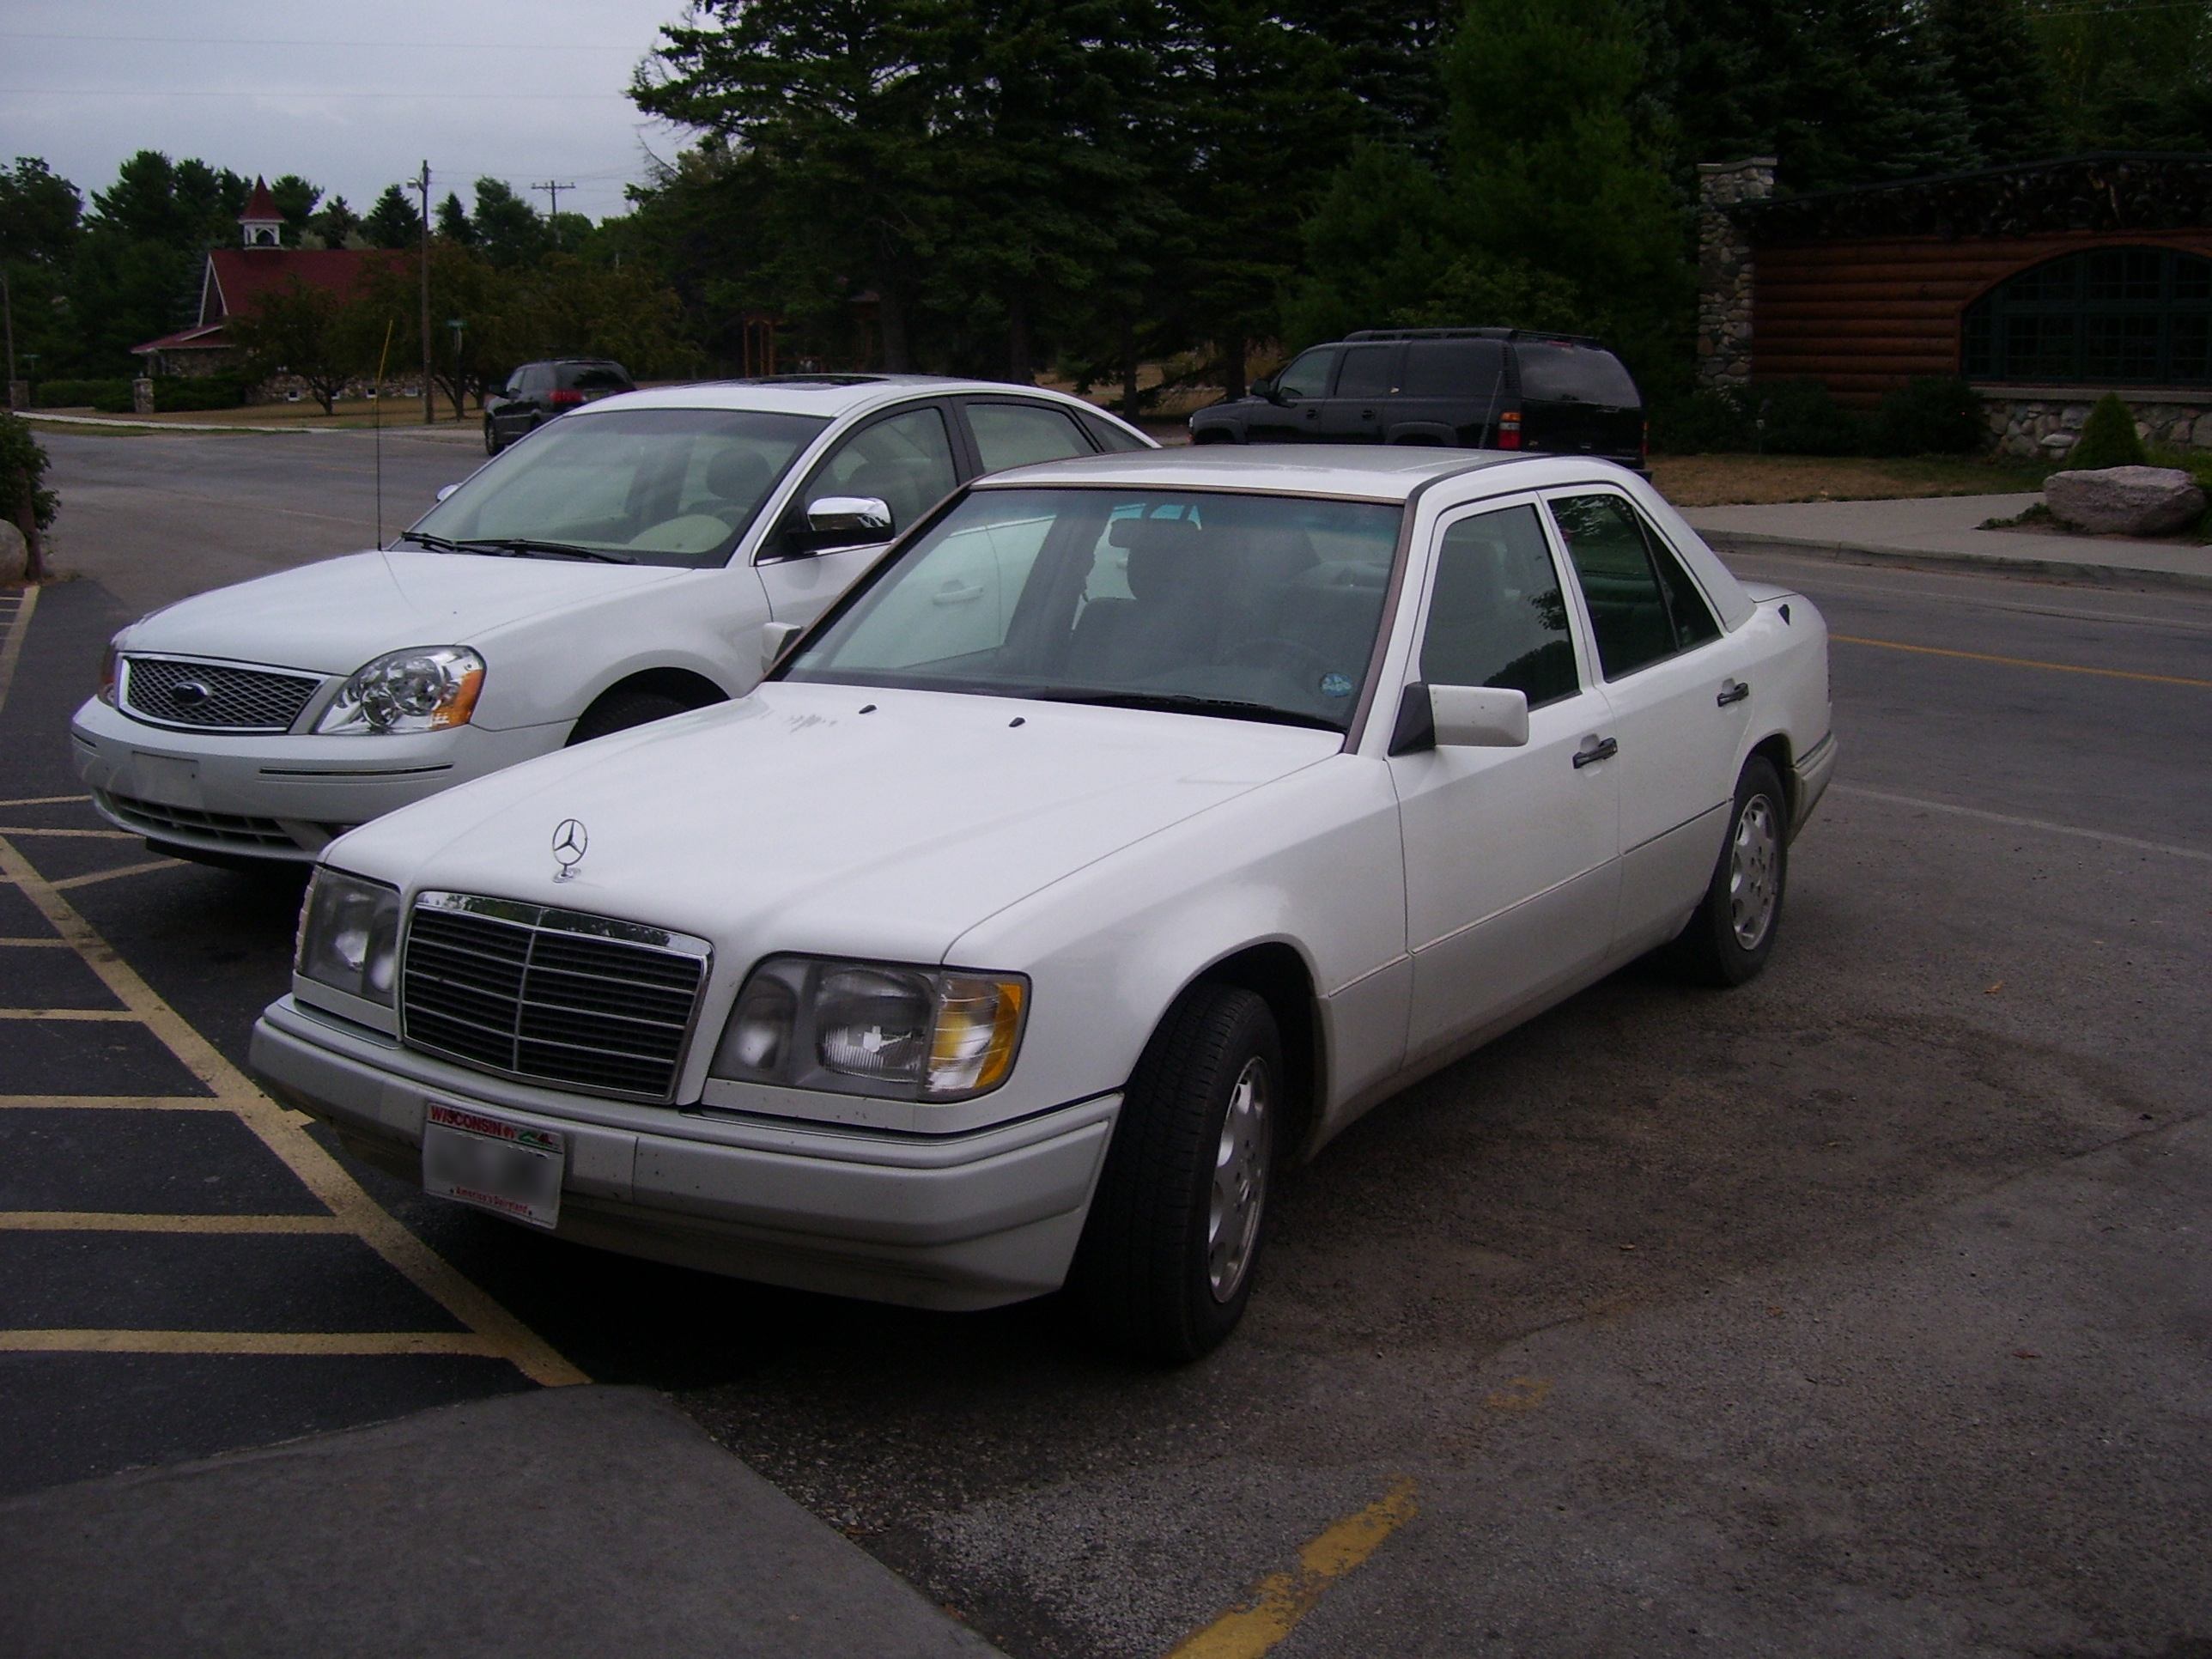 File:Mercedes-Benz E320 1994.jpg - Wikimedia Commons